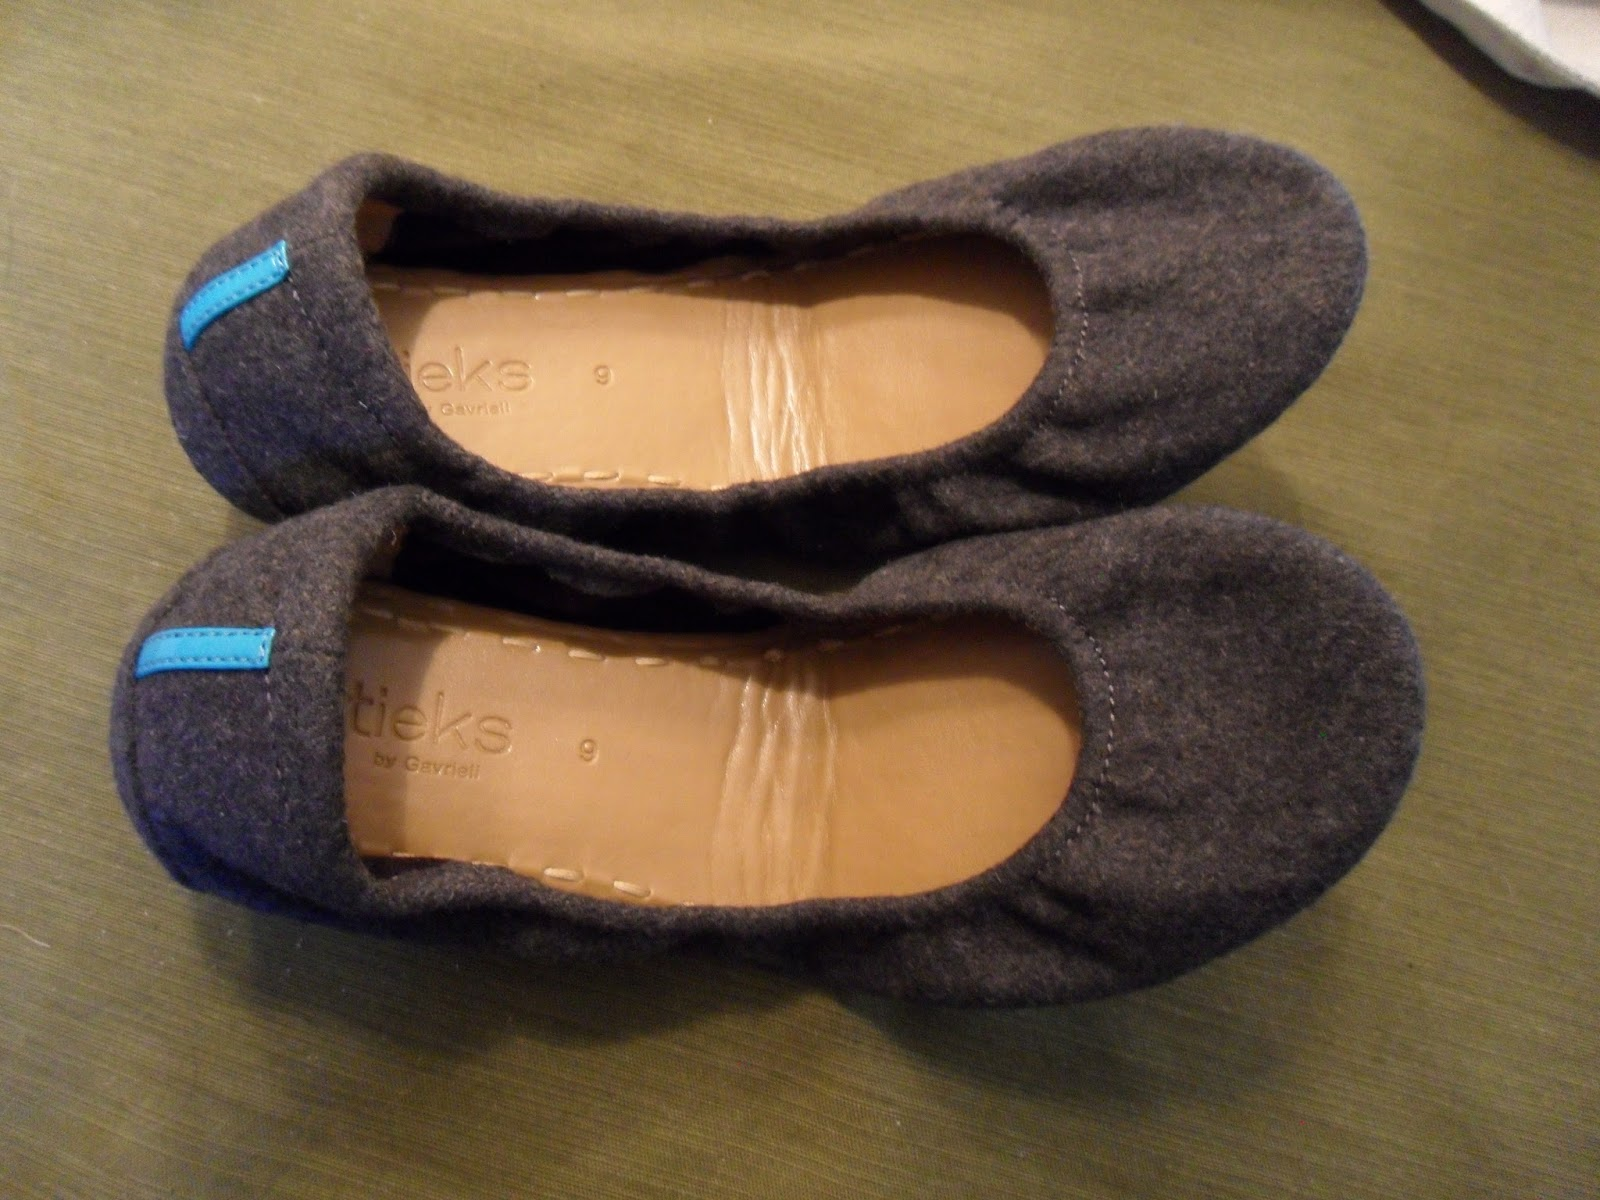 Tieks Shoes In Stores